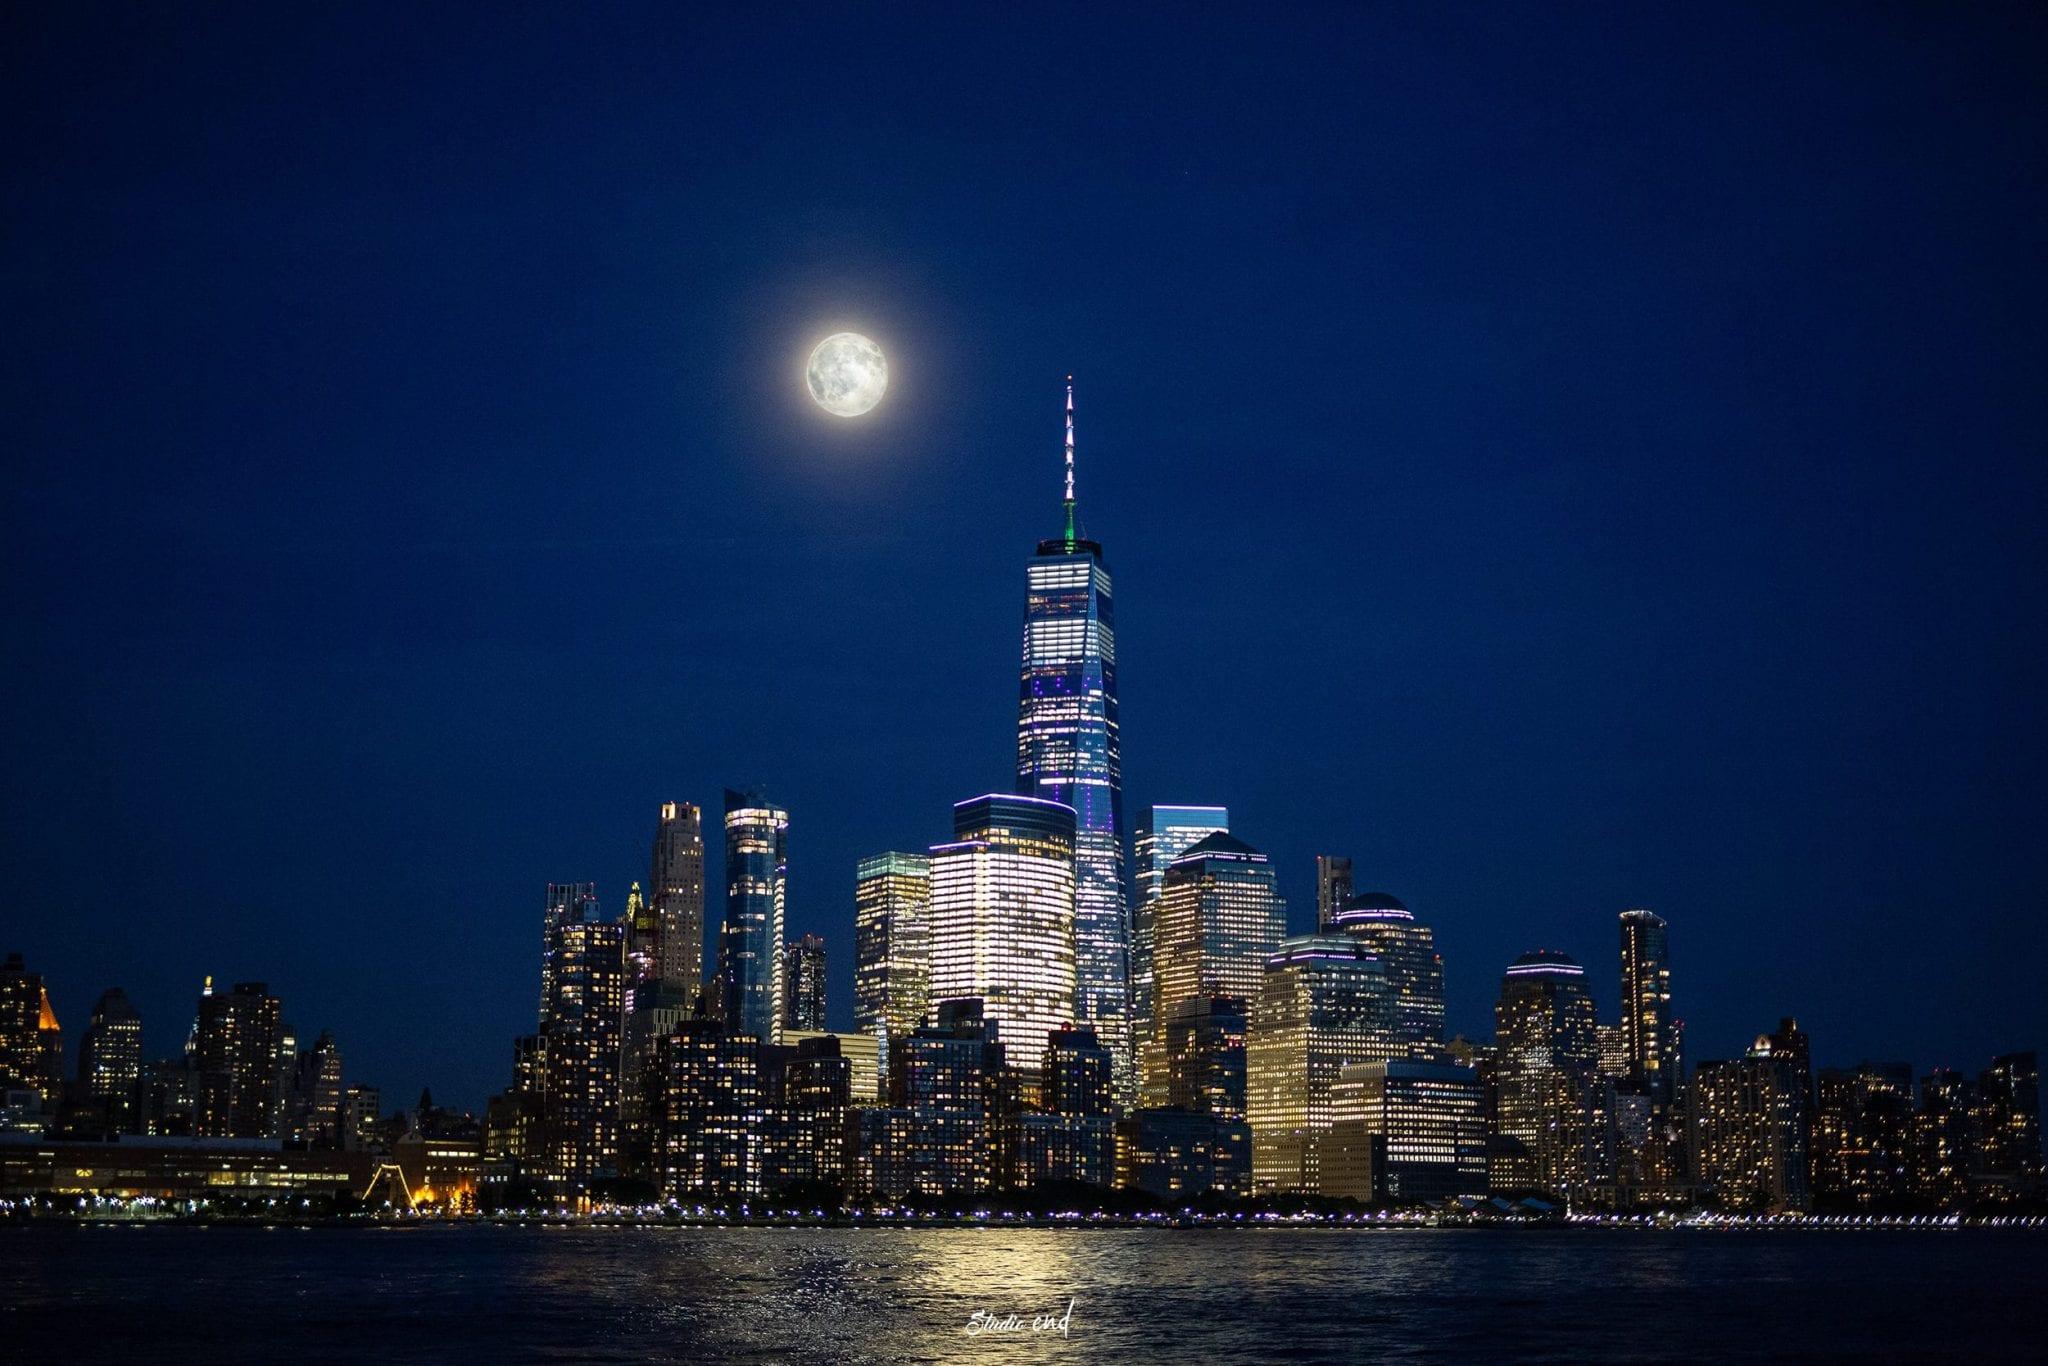 Vue de la Skyline et du One Word Trade Center de New York